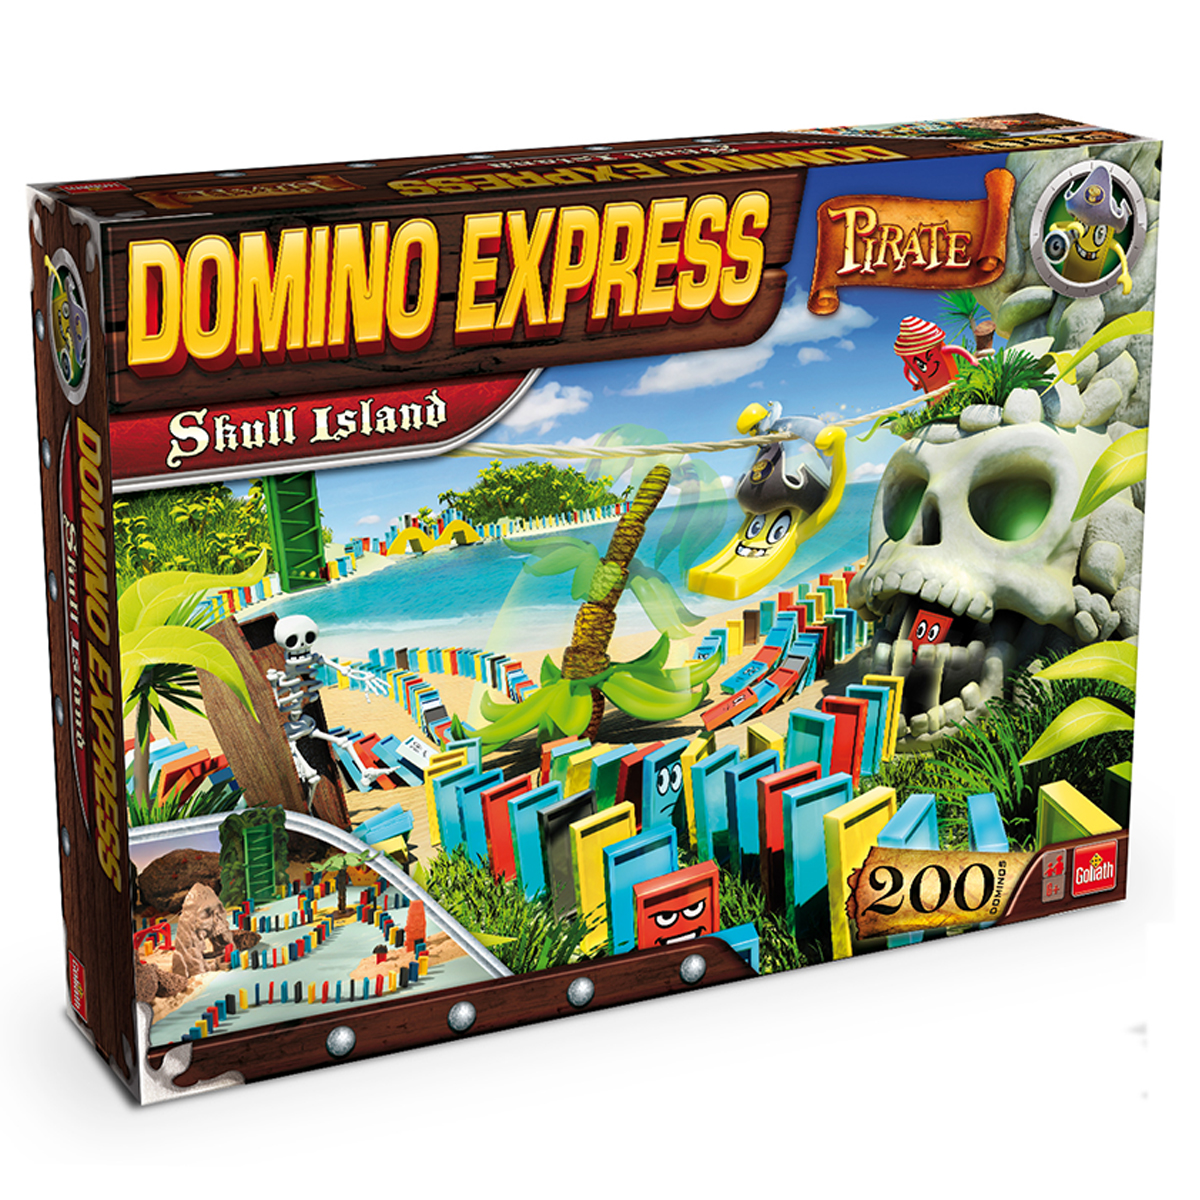 Domino express - Skull Island - Goliath